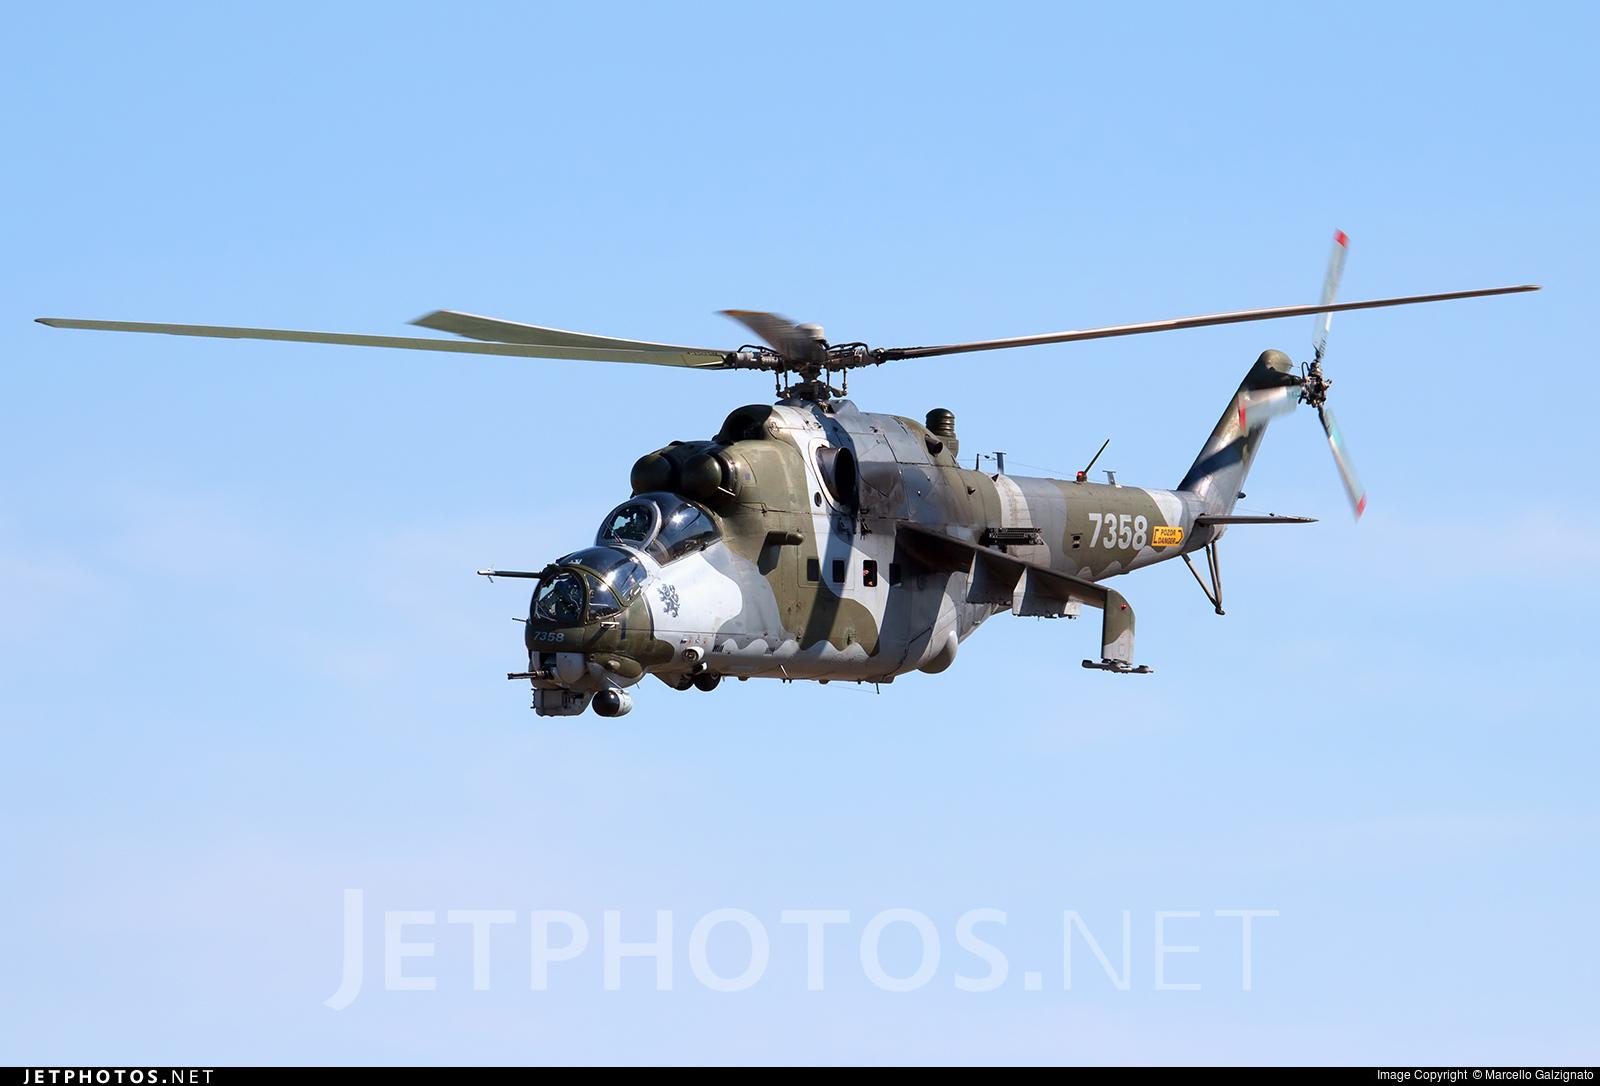 7358 - Mil Mi-24 Hind - Czech Republic - Air Force